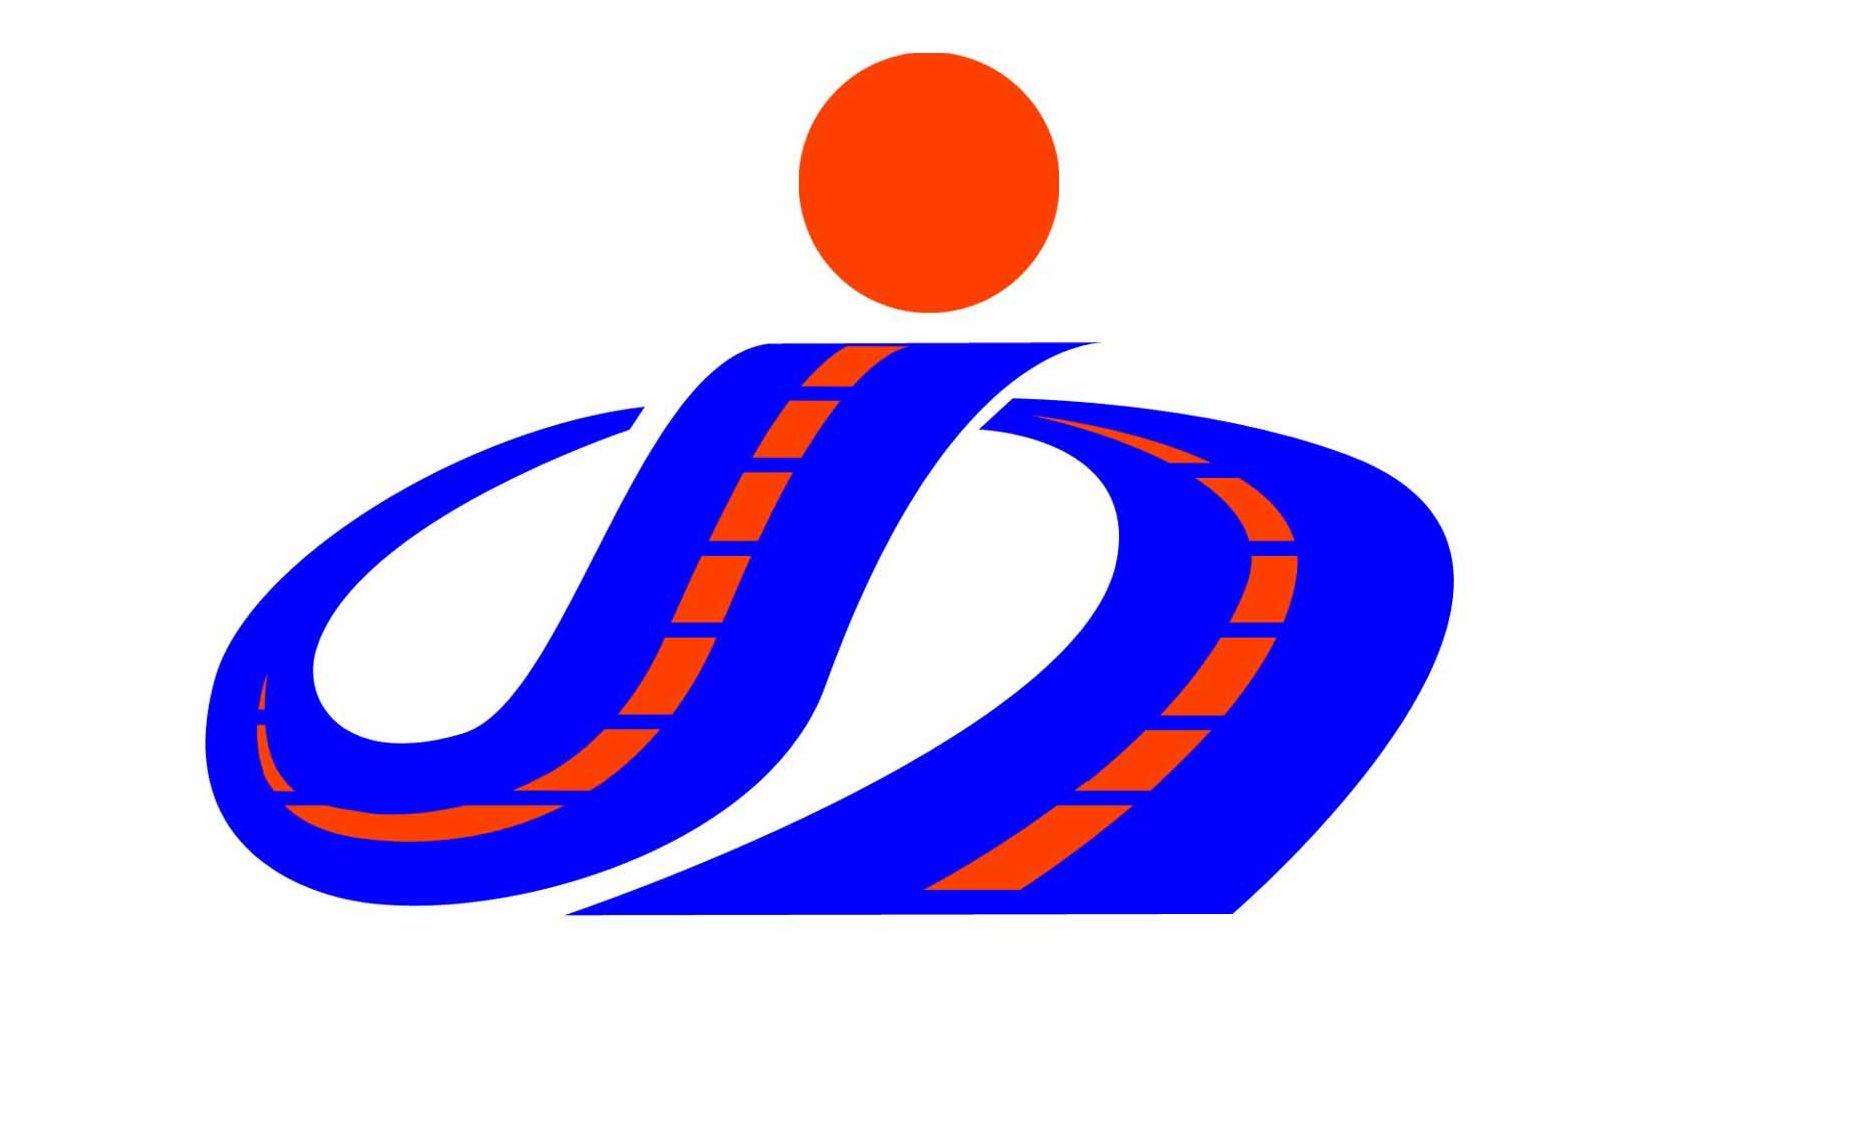 logo logo 标志 设计 图标 1861_1145